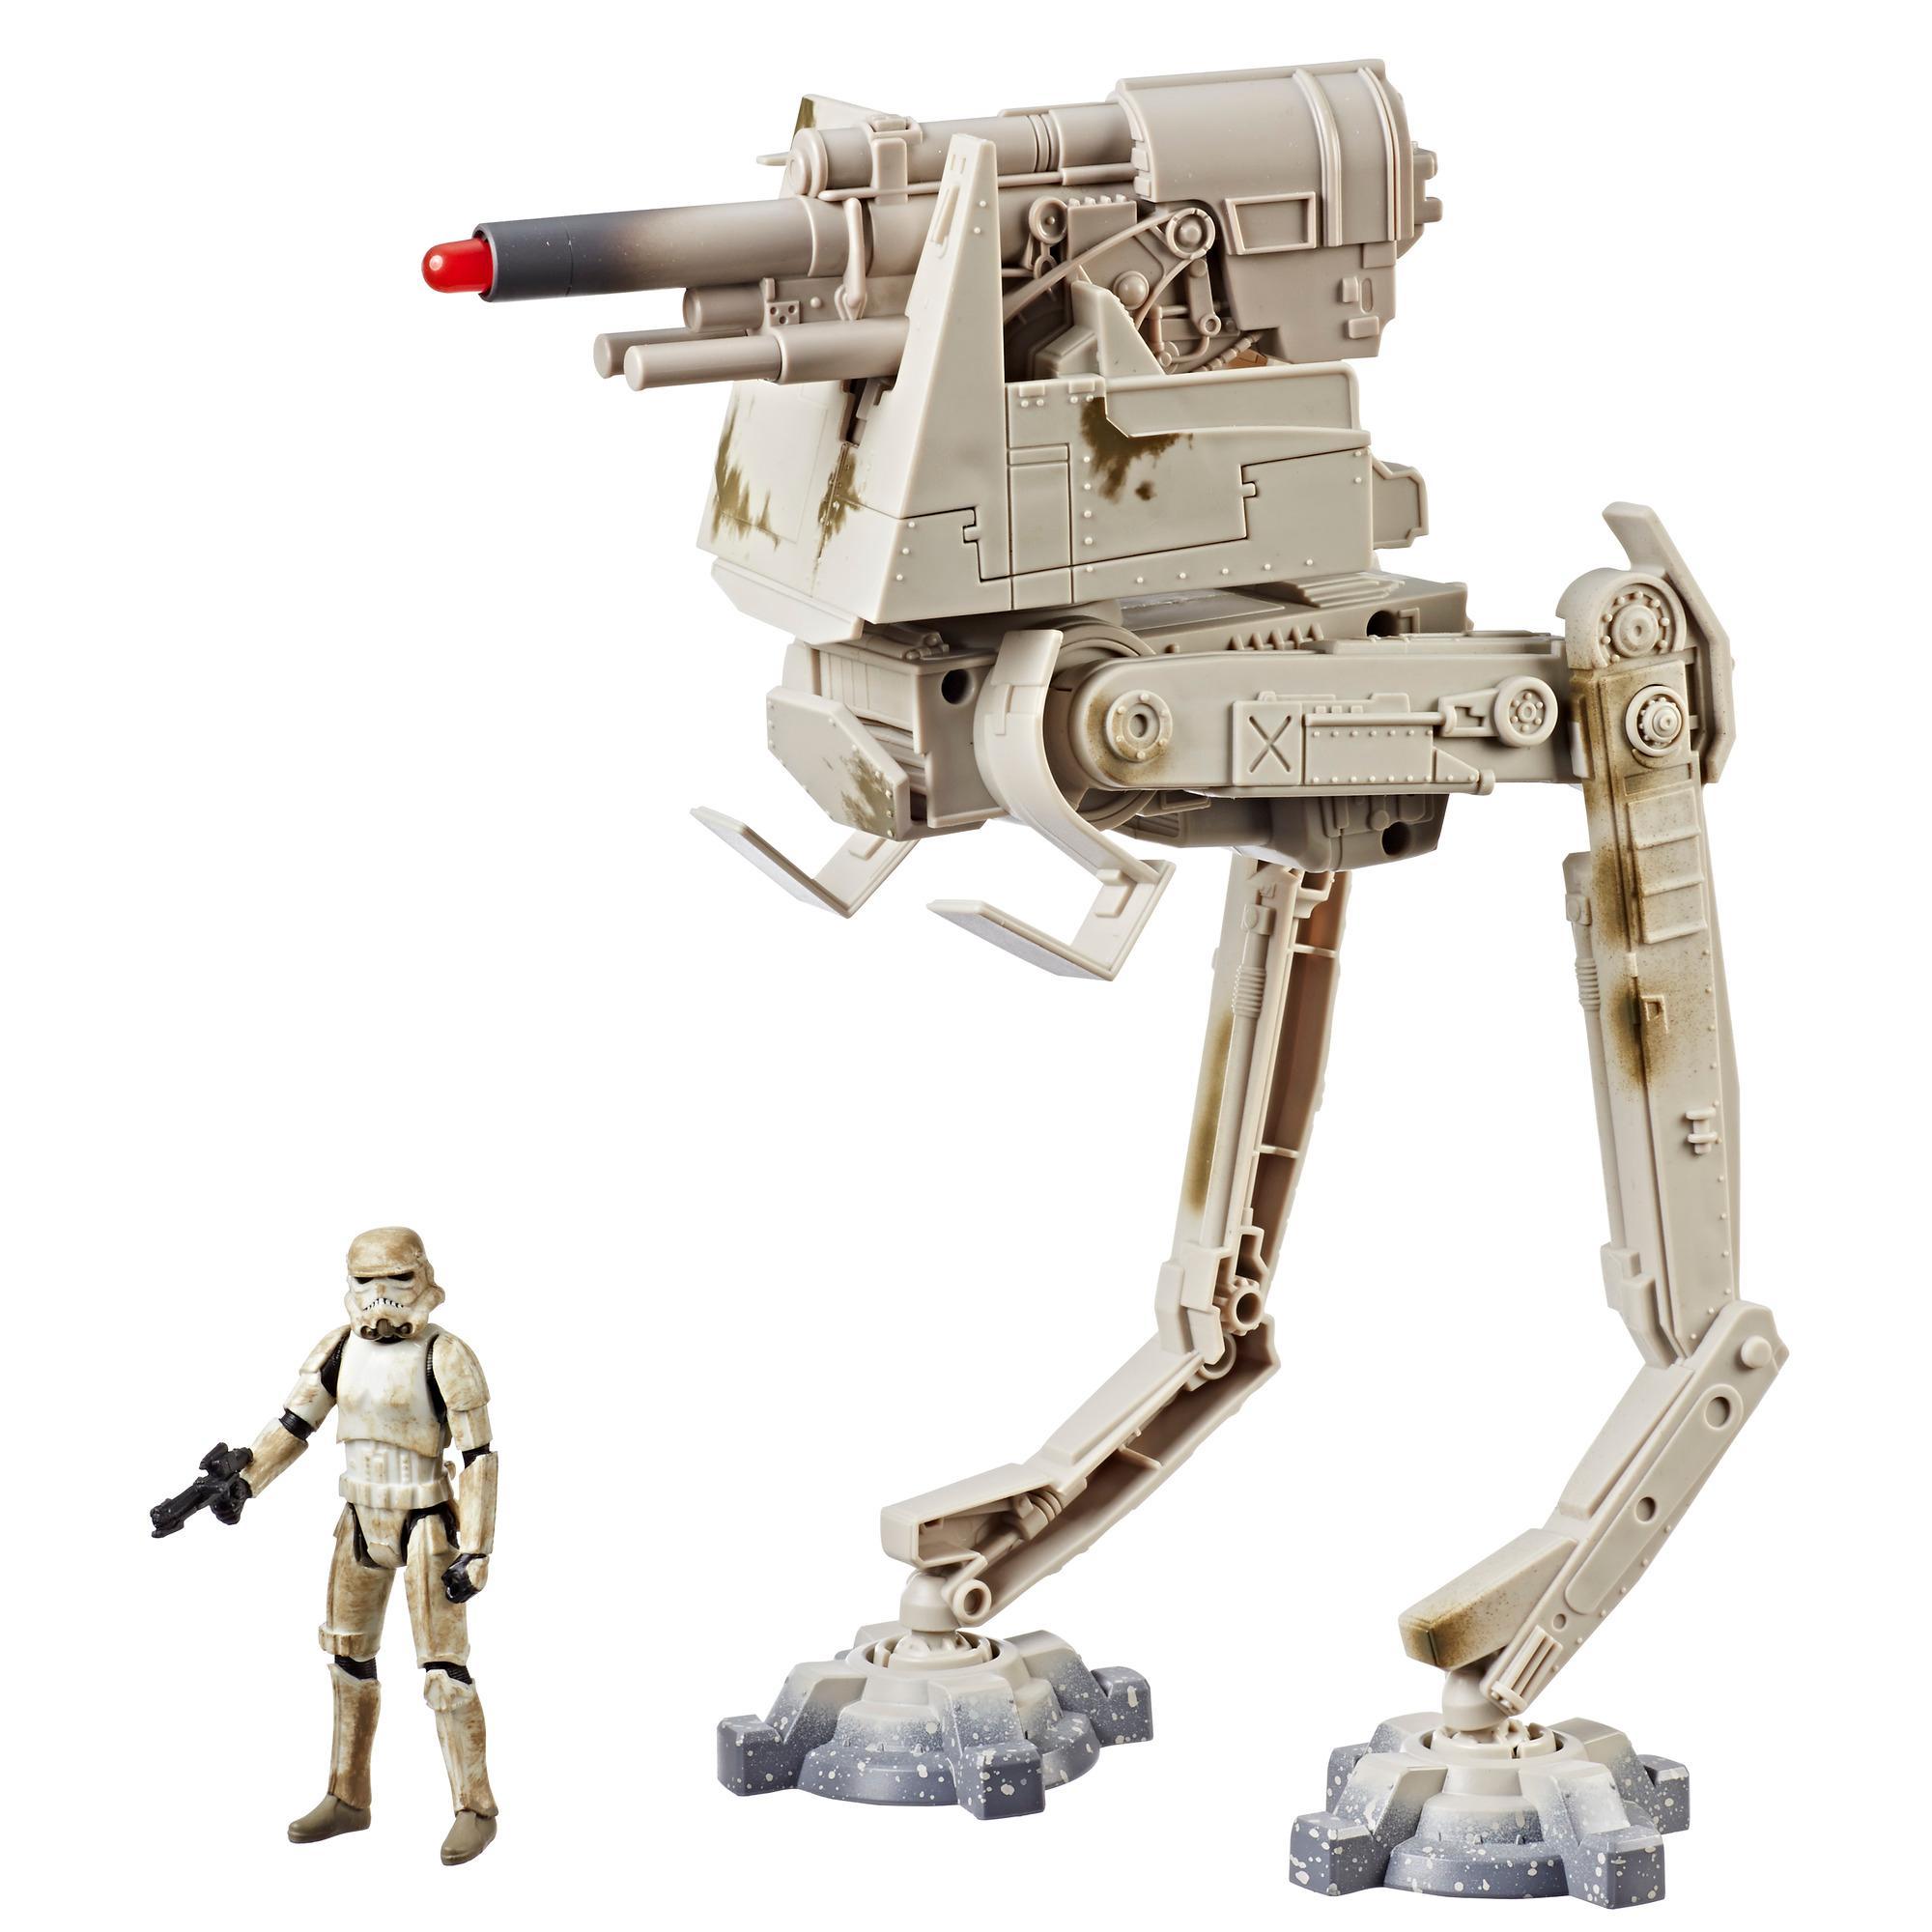 Star Wars Force Link 2.0 - Marcheur impérial AT-DT avec figurines Stormtrooper (Mimban)